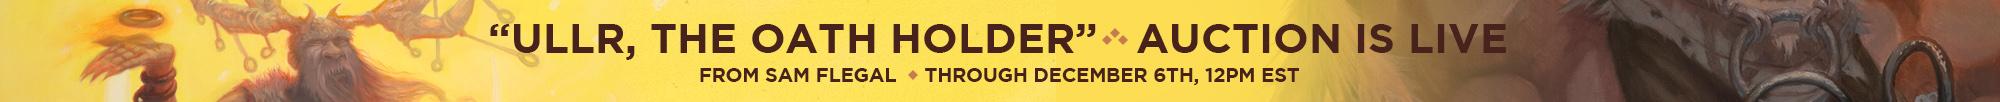 Sam Flegal Oath Holder auction banner homepage